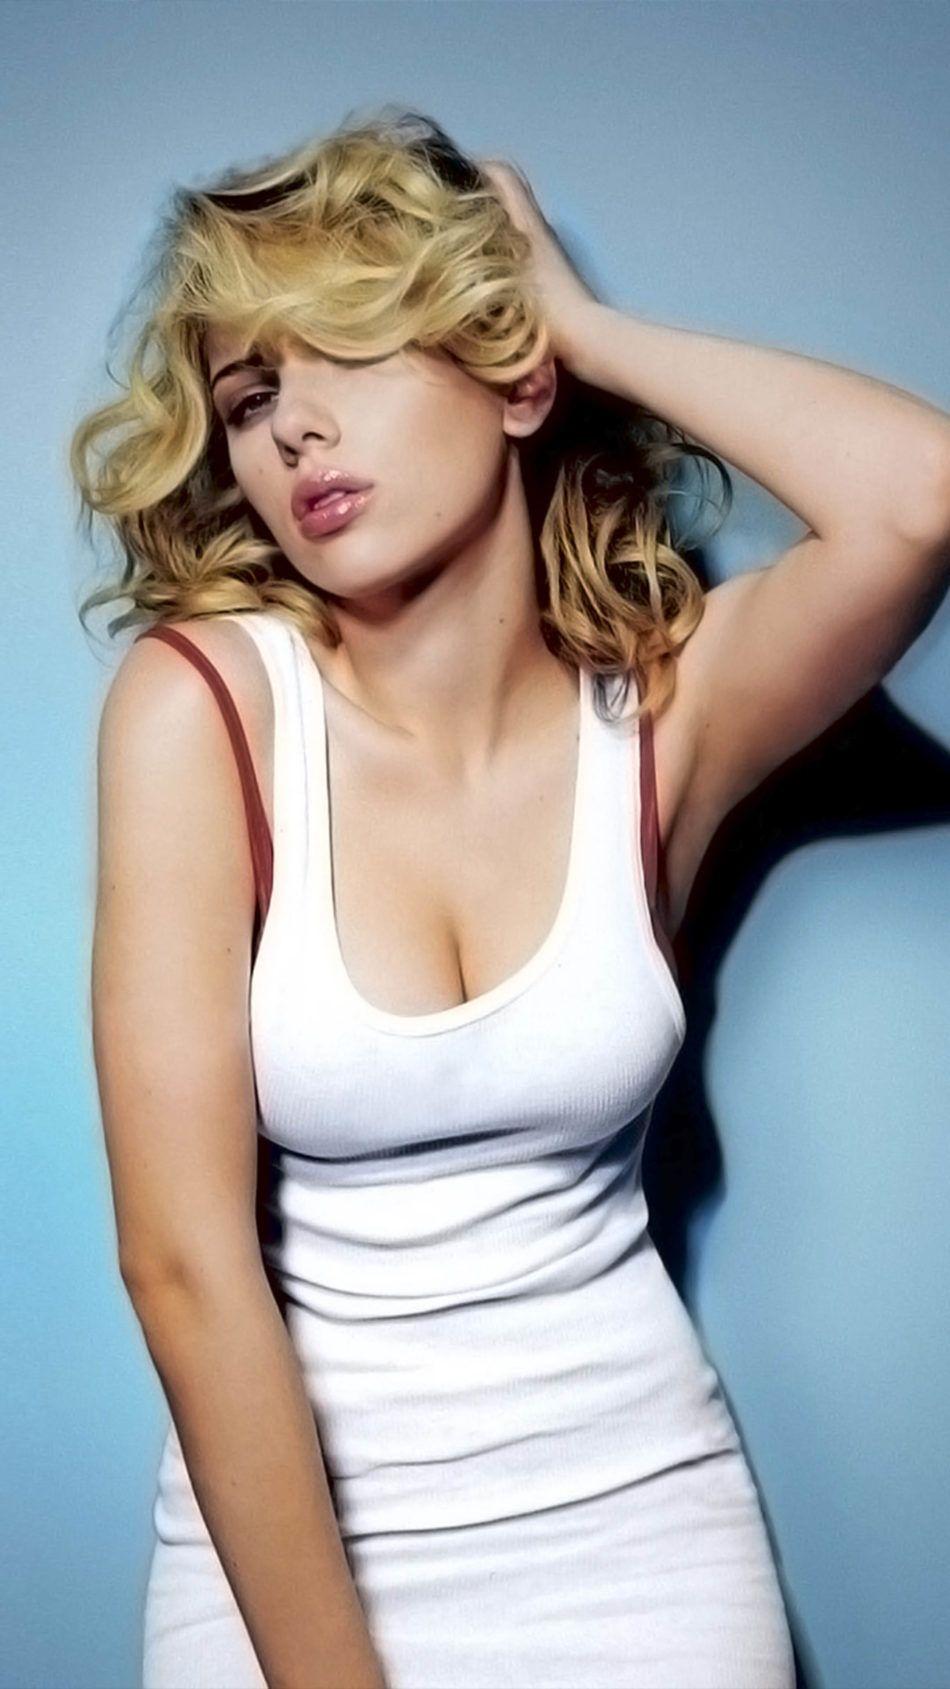 Scarlett Johansson In Hot White Dress 4k Ultra Hd Mobile Wallpaper Scarlett Johansson Bikini Scarlett Johansson Scarlett Johanson